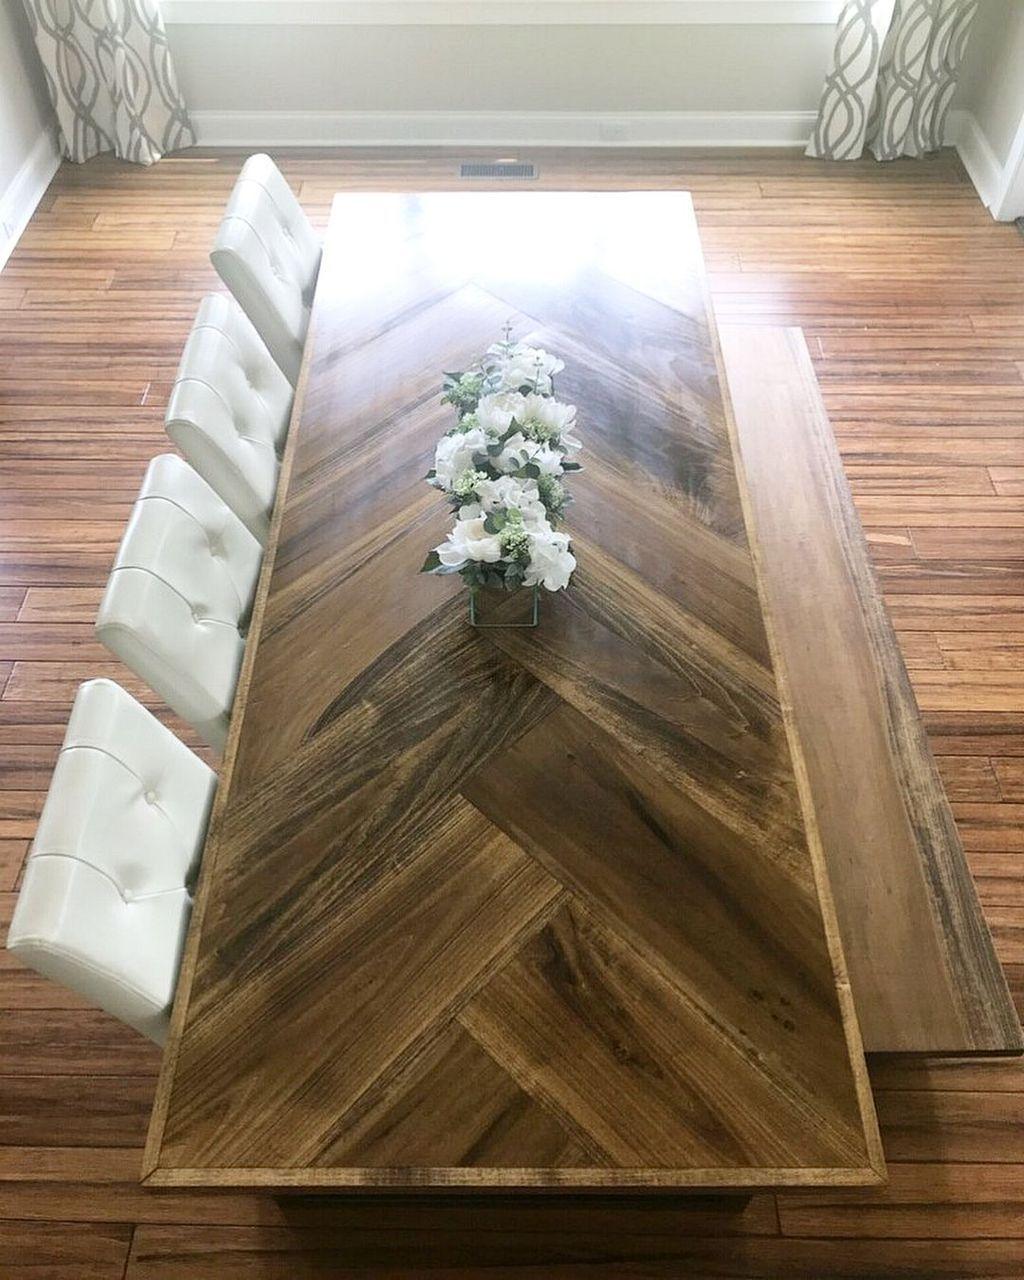 46 Inspiring Mid Century Dining Room Table Decor Ideas – decoomo.com